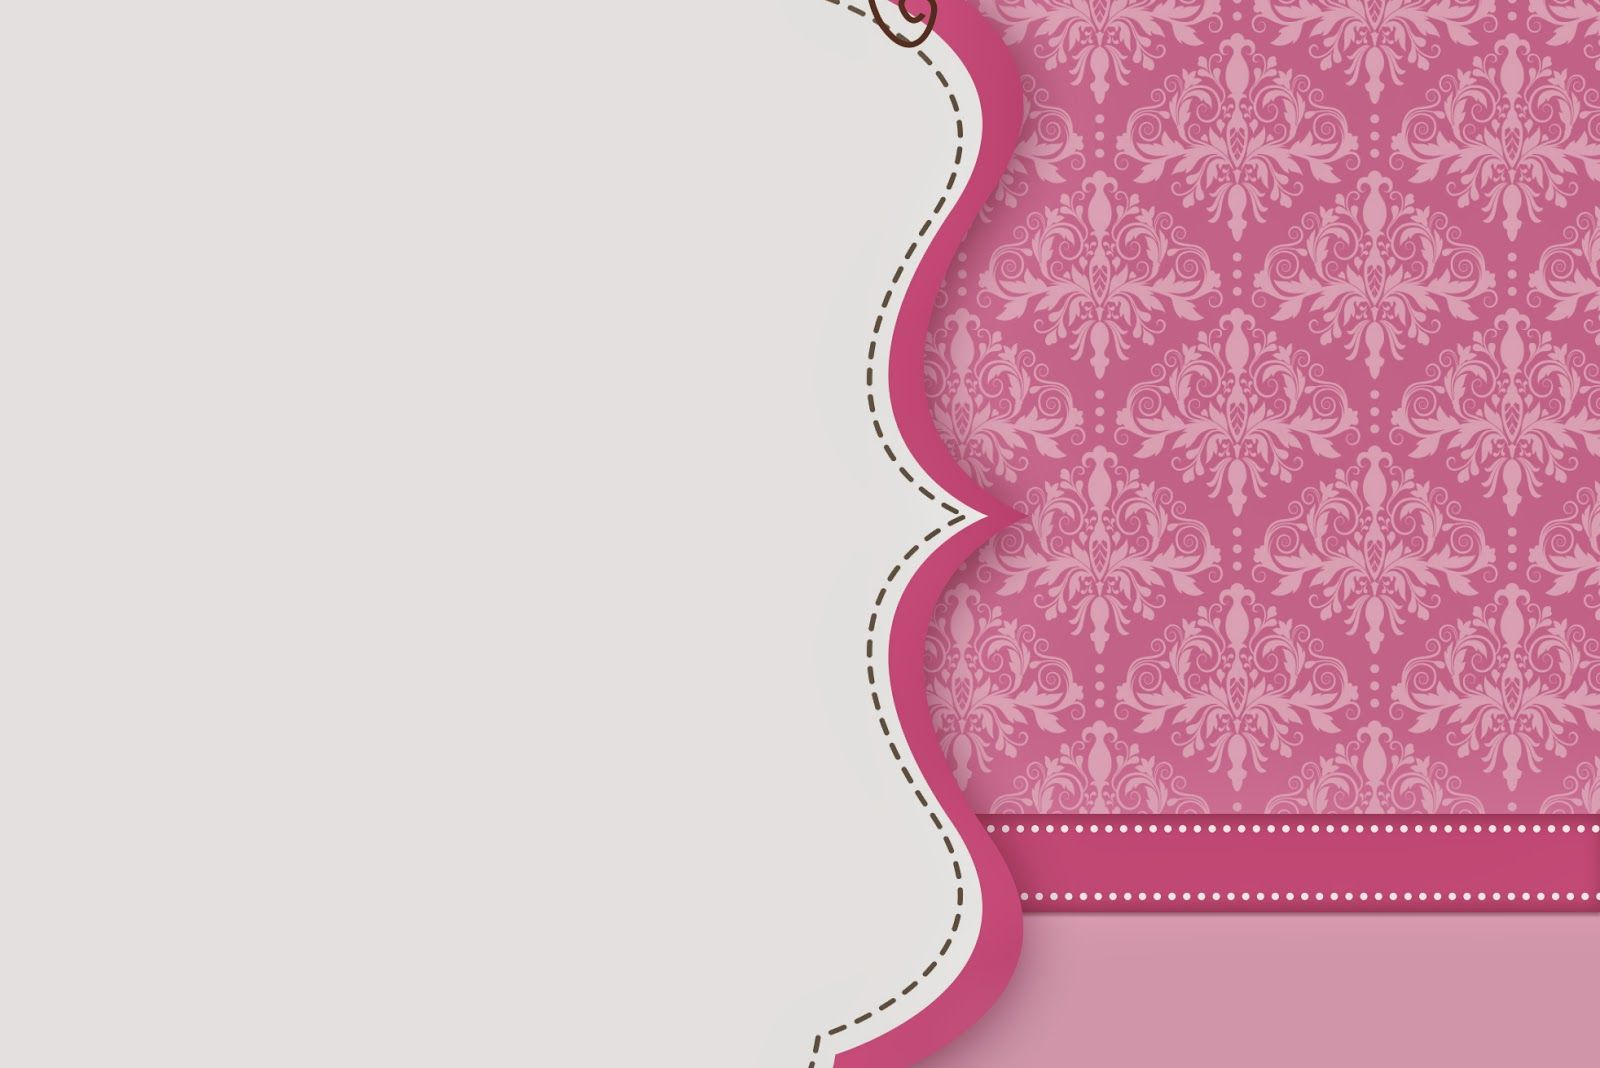 Damascos rosa invitaciones para imprimir gratis - Fotos de damasco ...